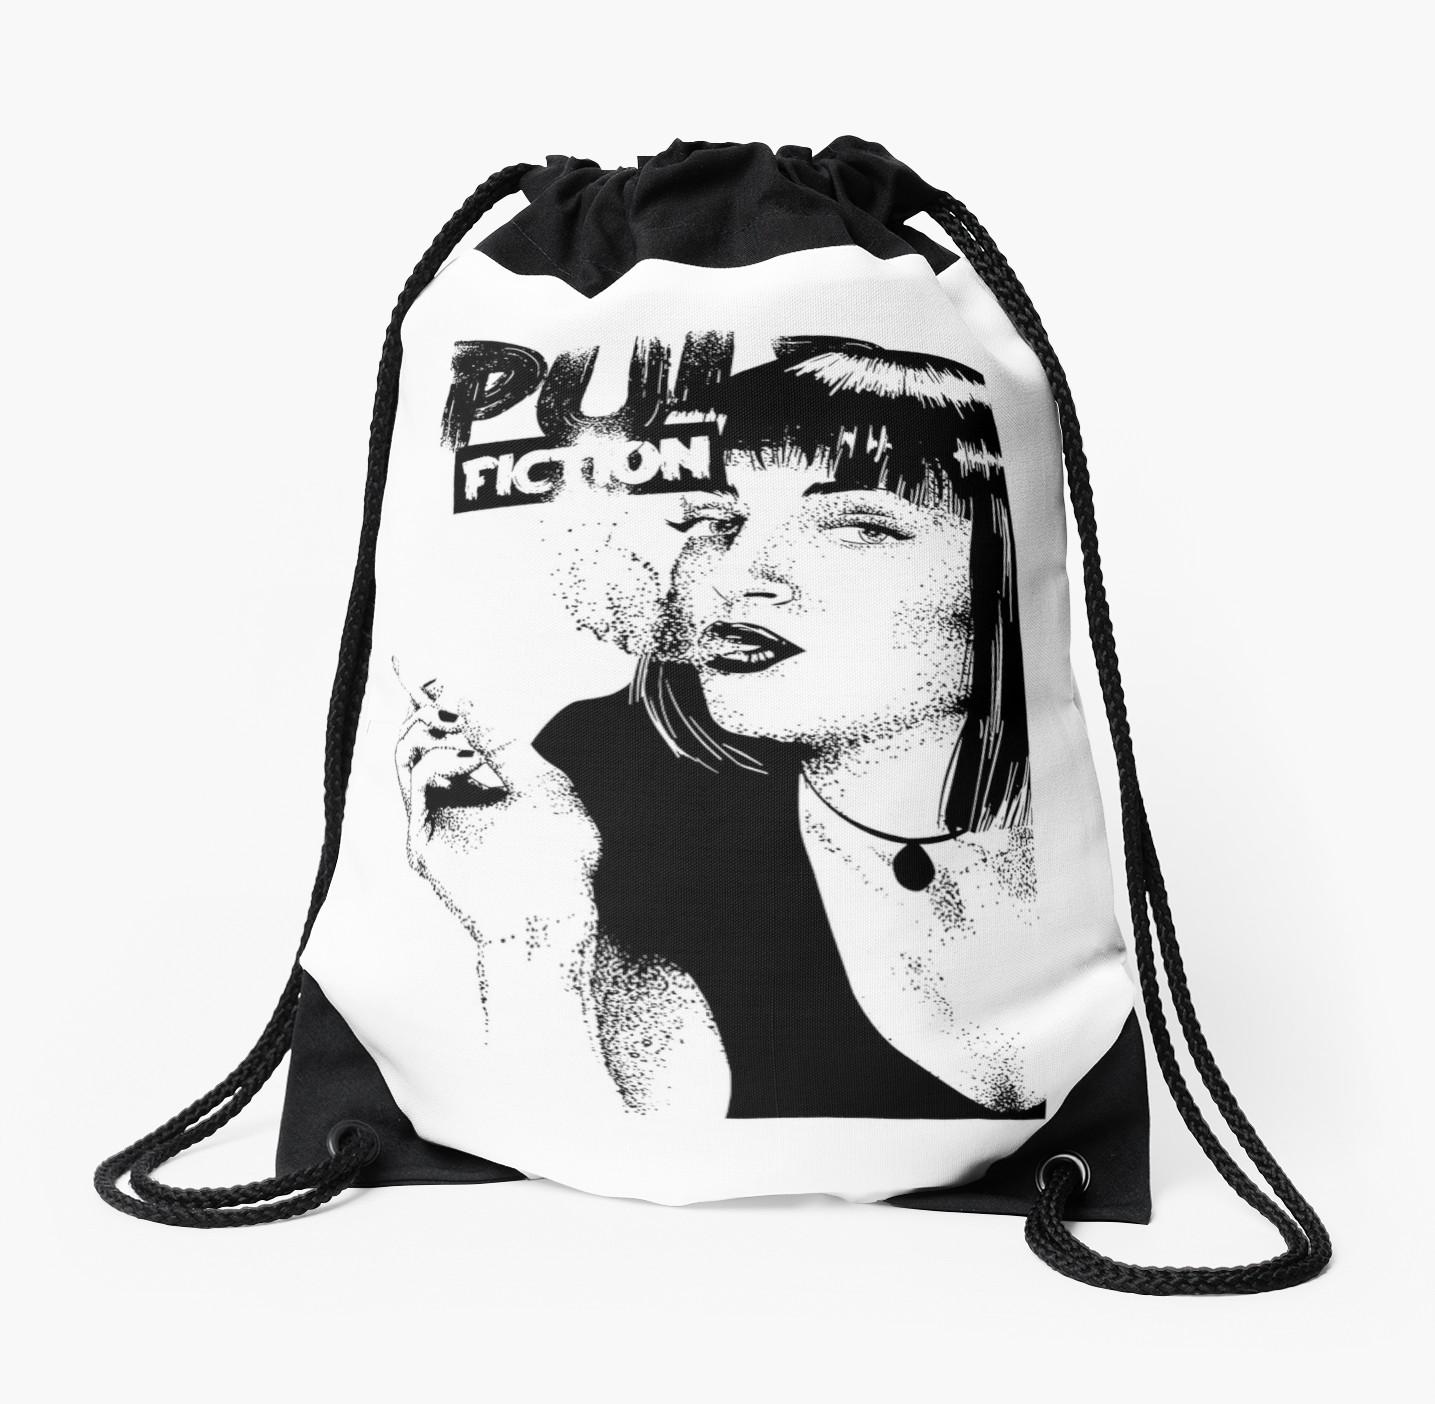 1435x1404 A Series Of Pulp Fiction Drawstring Bag